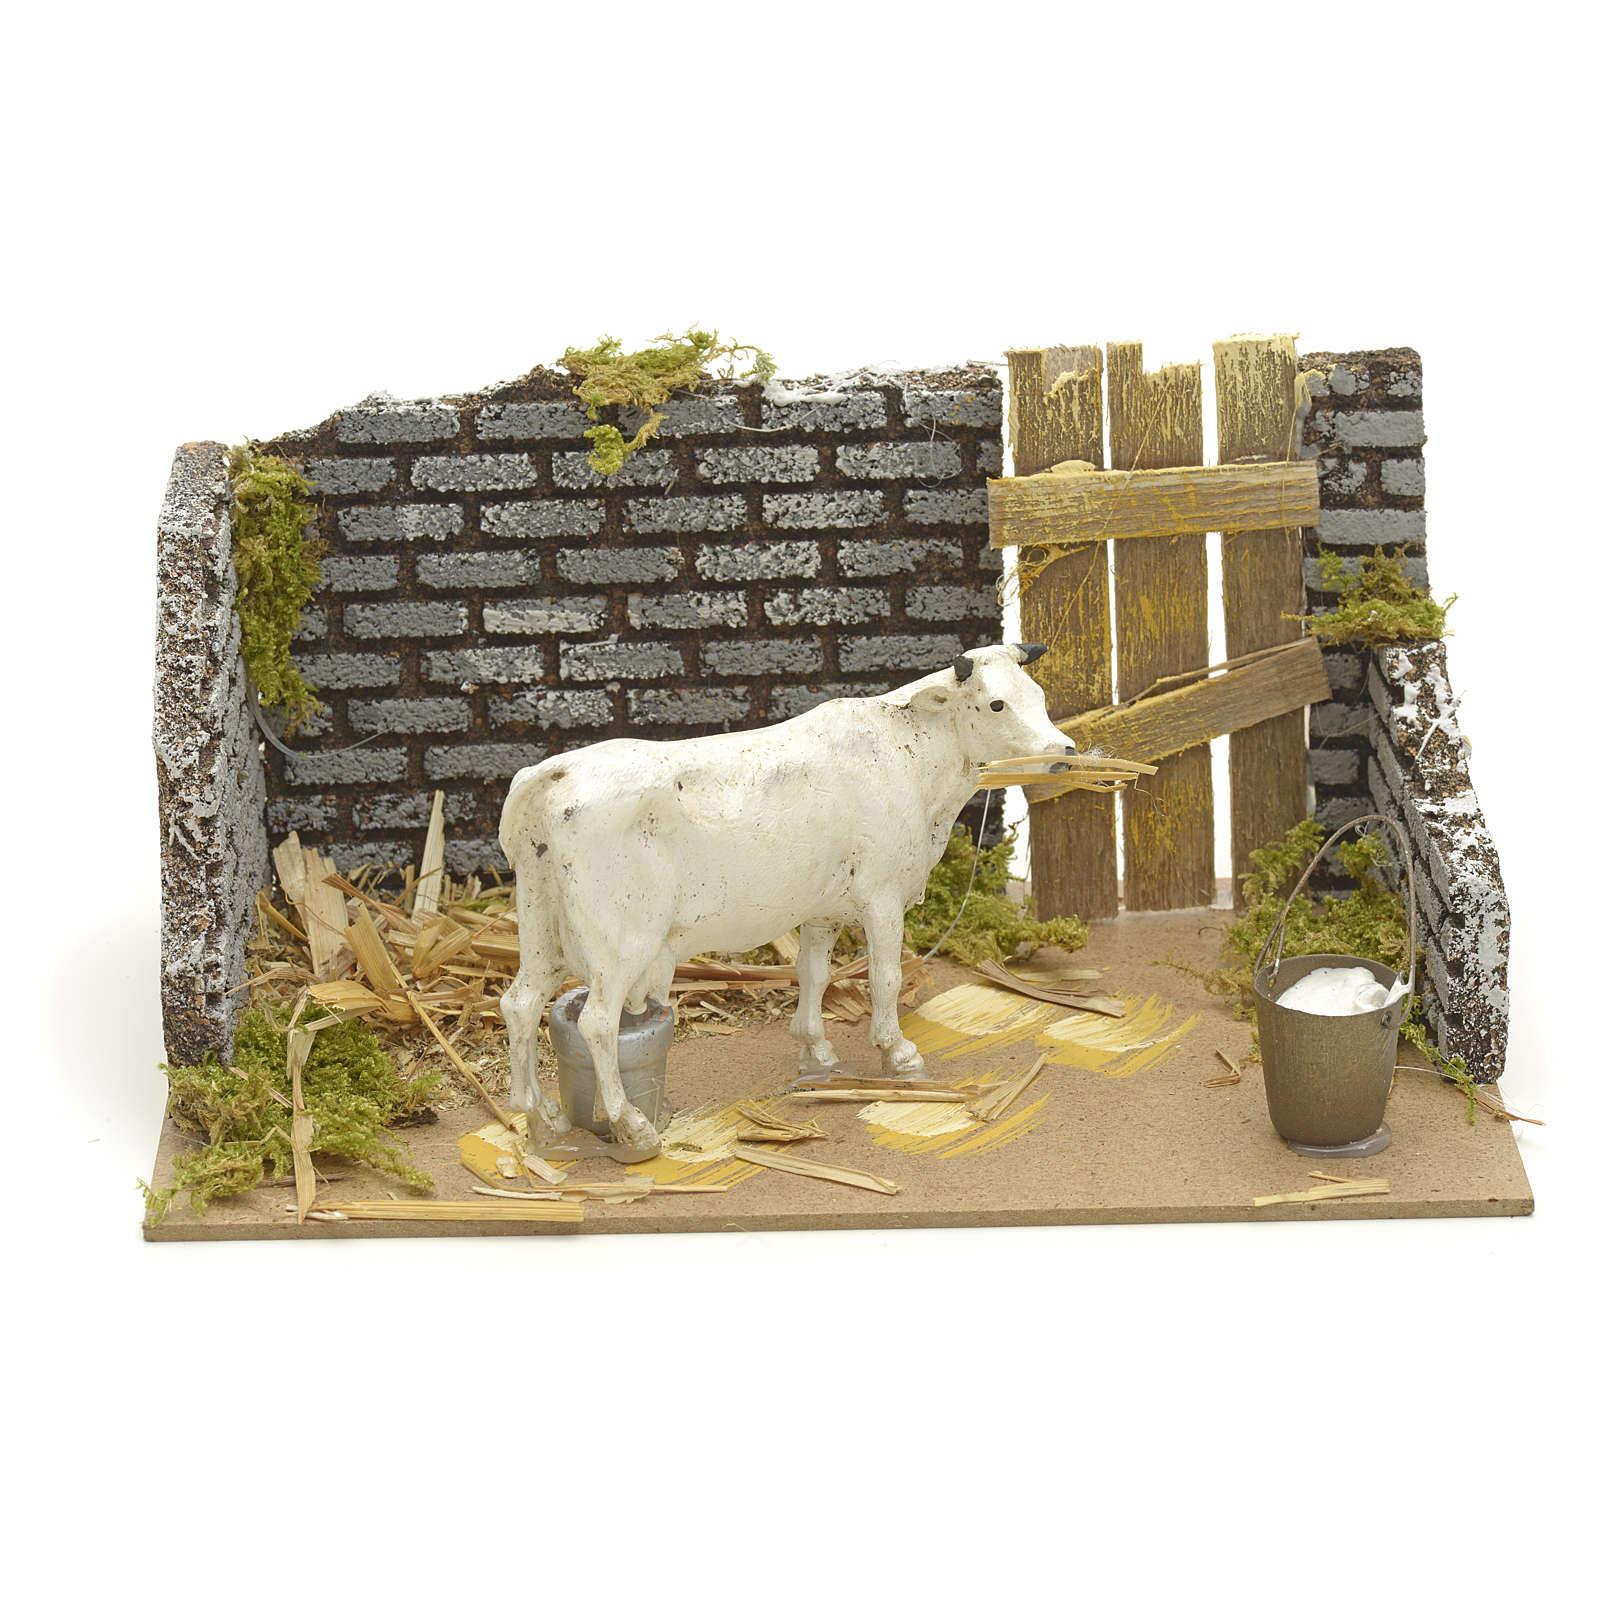 Ambiente presepe con mucca 15x20x12 4